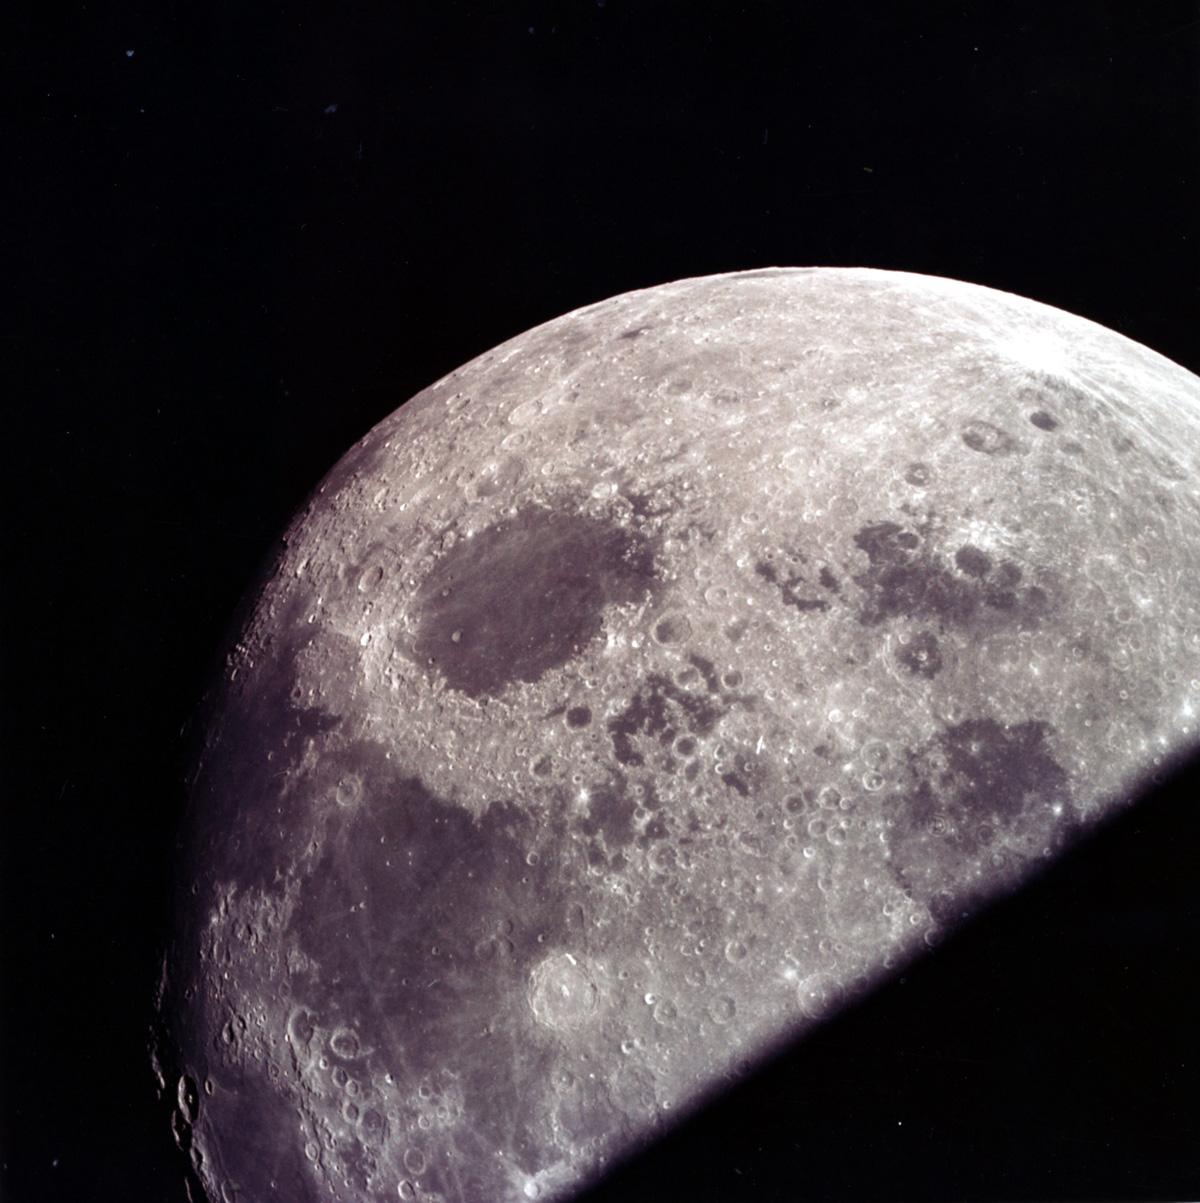 Lunar Crisium Basin